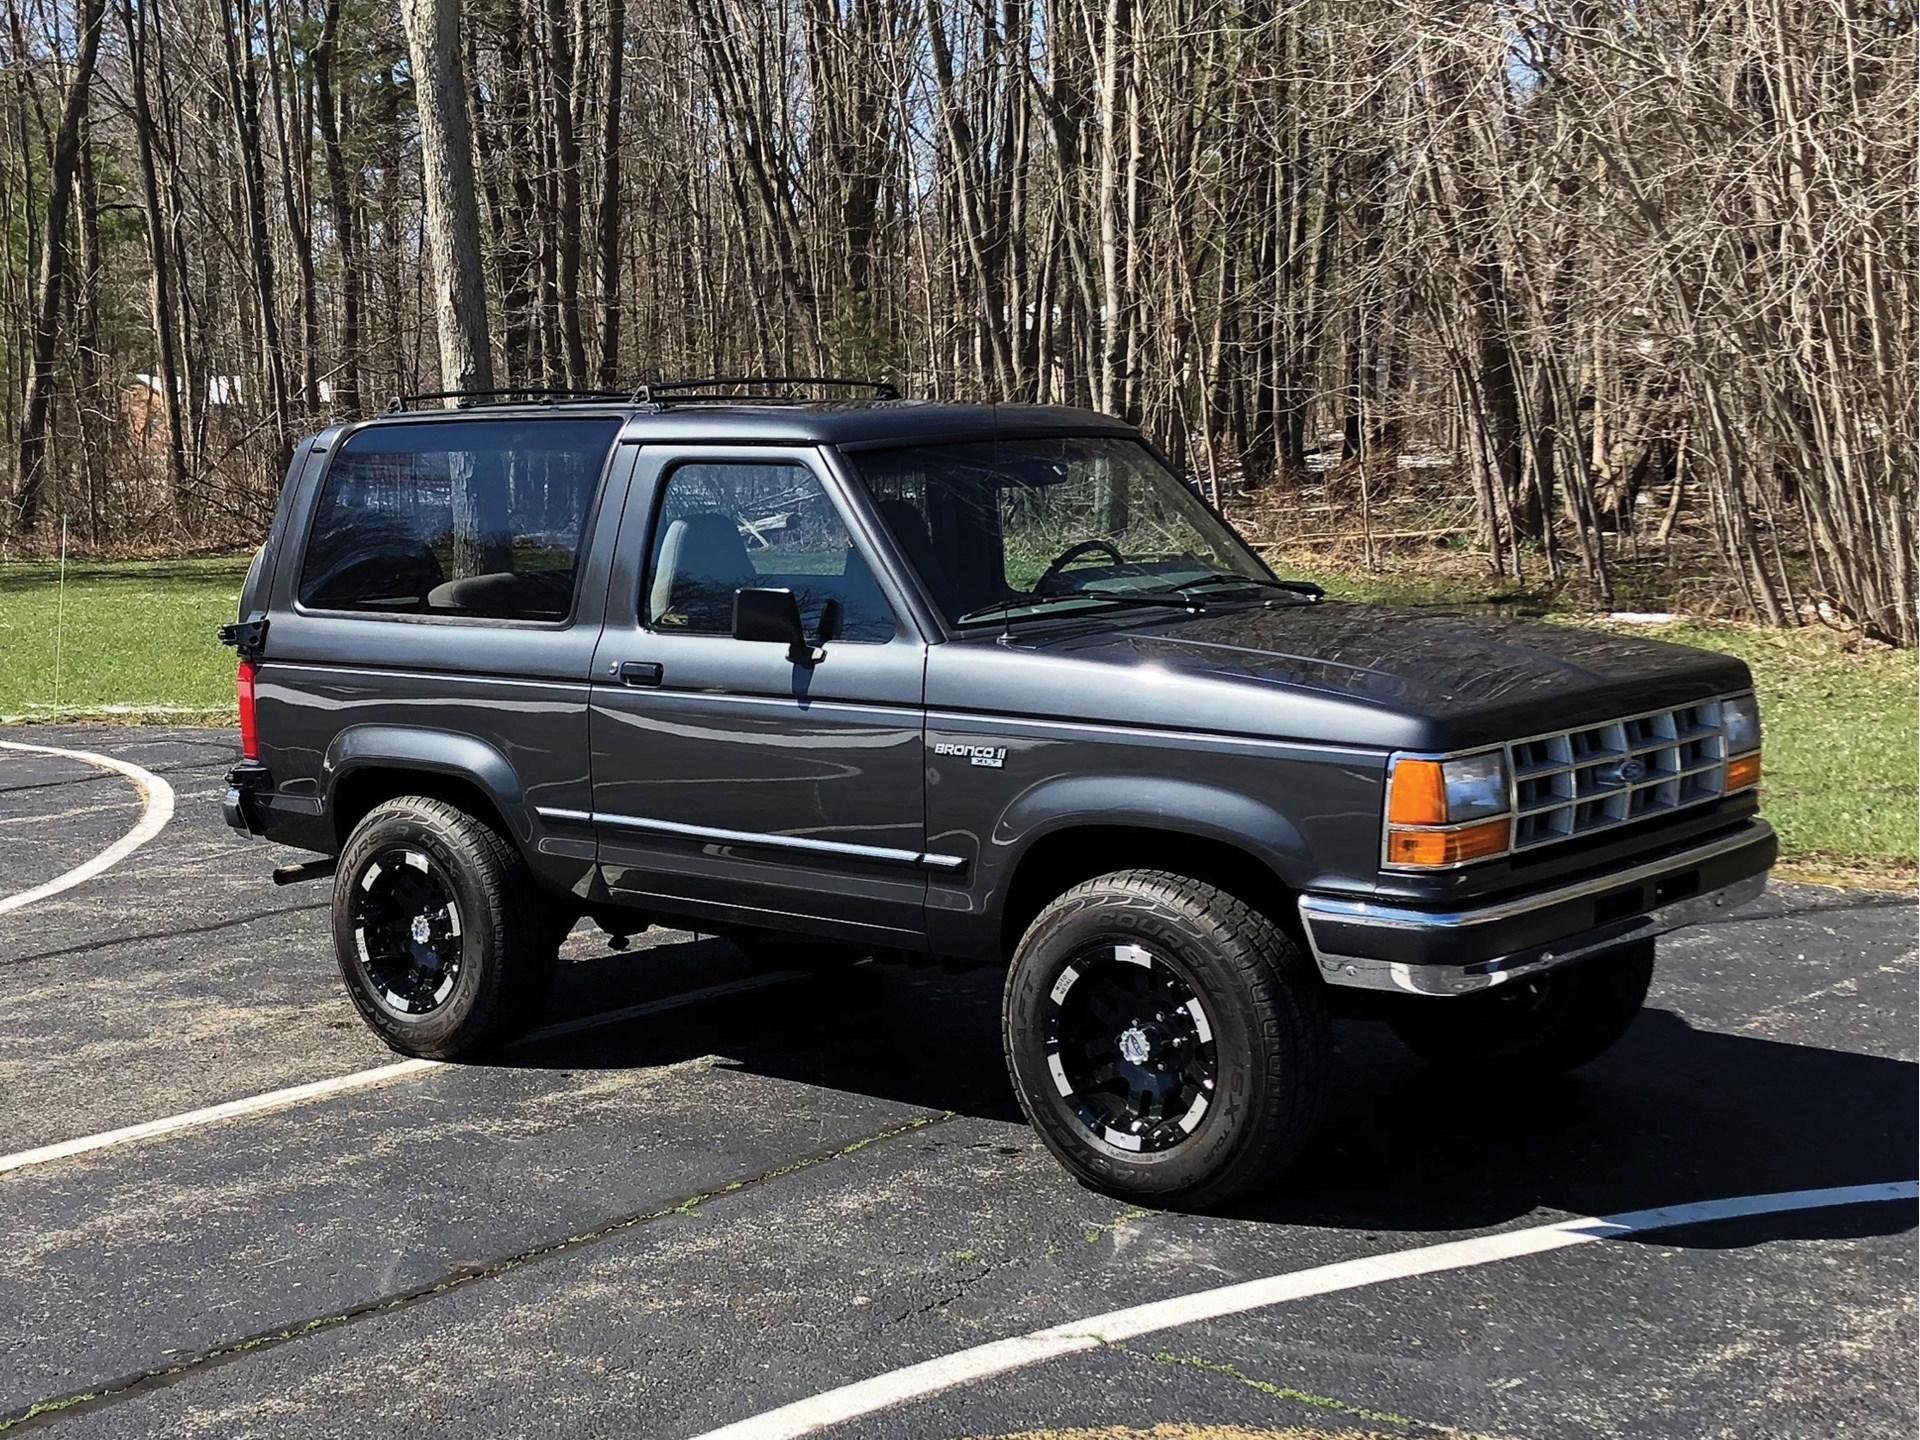 1990 Ford Bronco II Xt